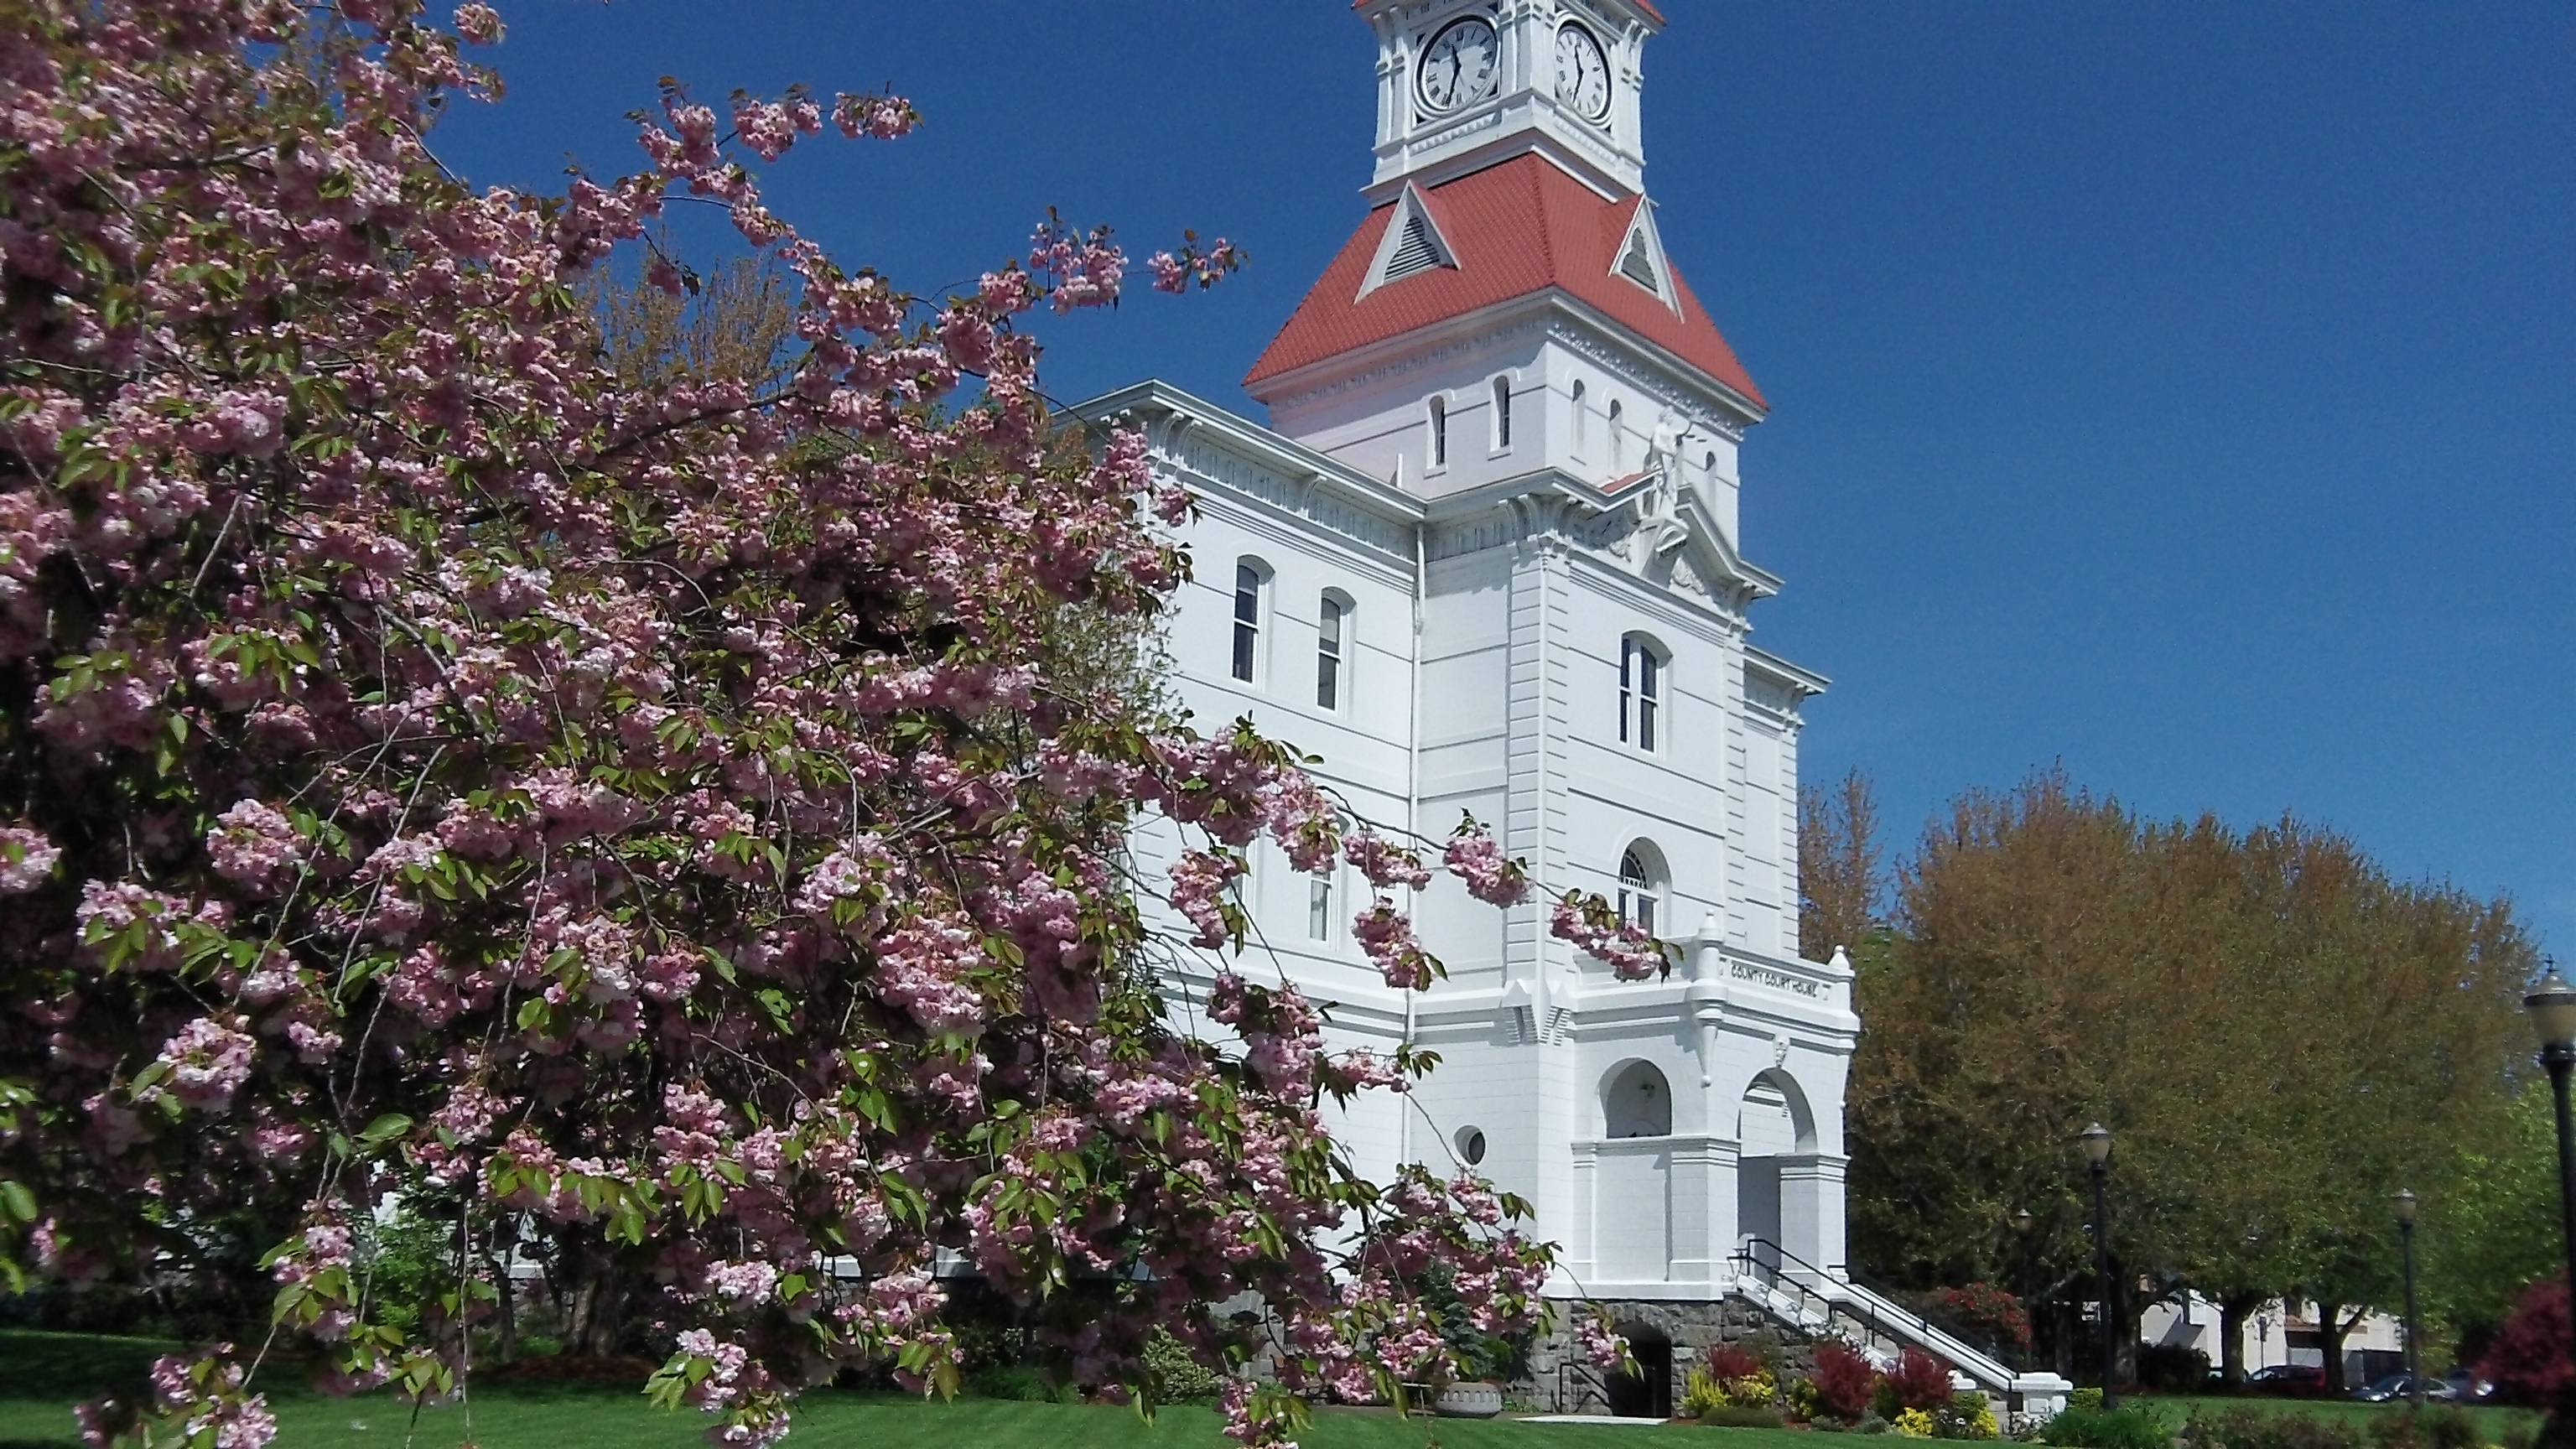 The Benton County Courthouse, a beloved Corvallis landmark.